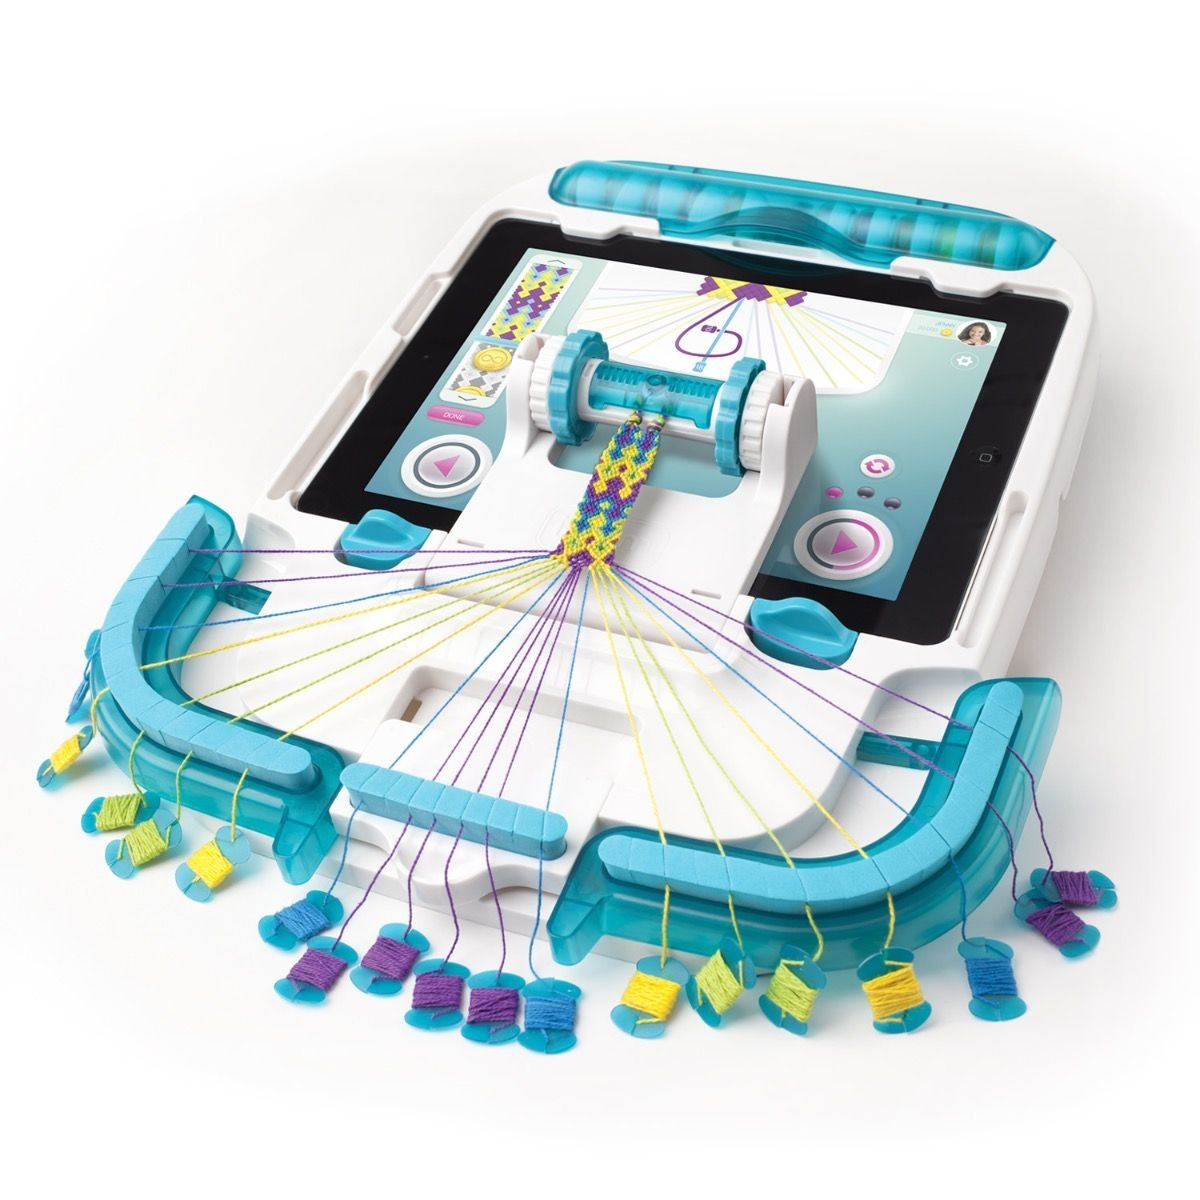 Works with Official App Chevron Friendship Bracelet Maker Weaving // Knitting Loom with Multiple Patterns Bracelet Making Craft Kit i-Loom Deluxe Starter Pack SMU-8008 Style Me Up